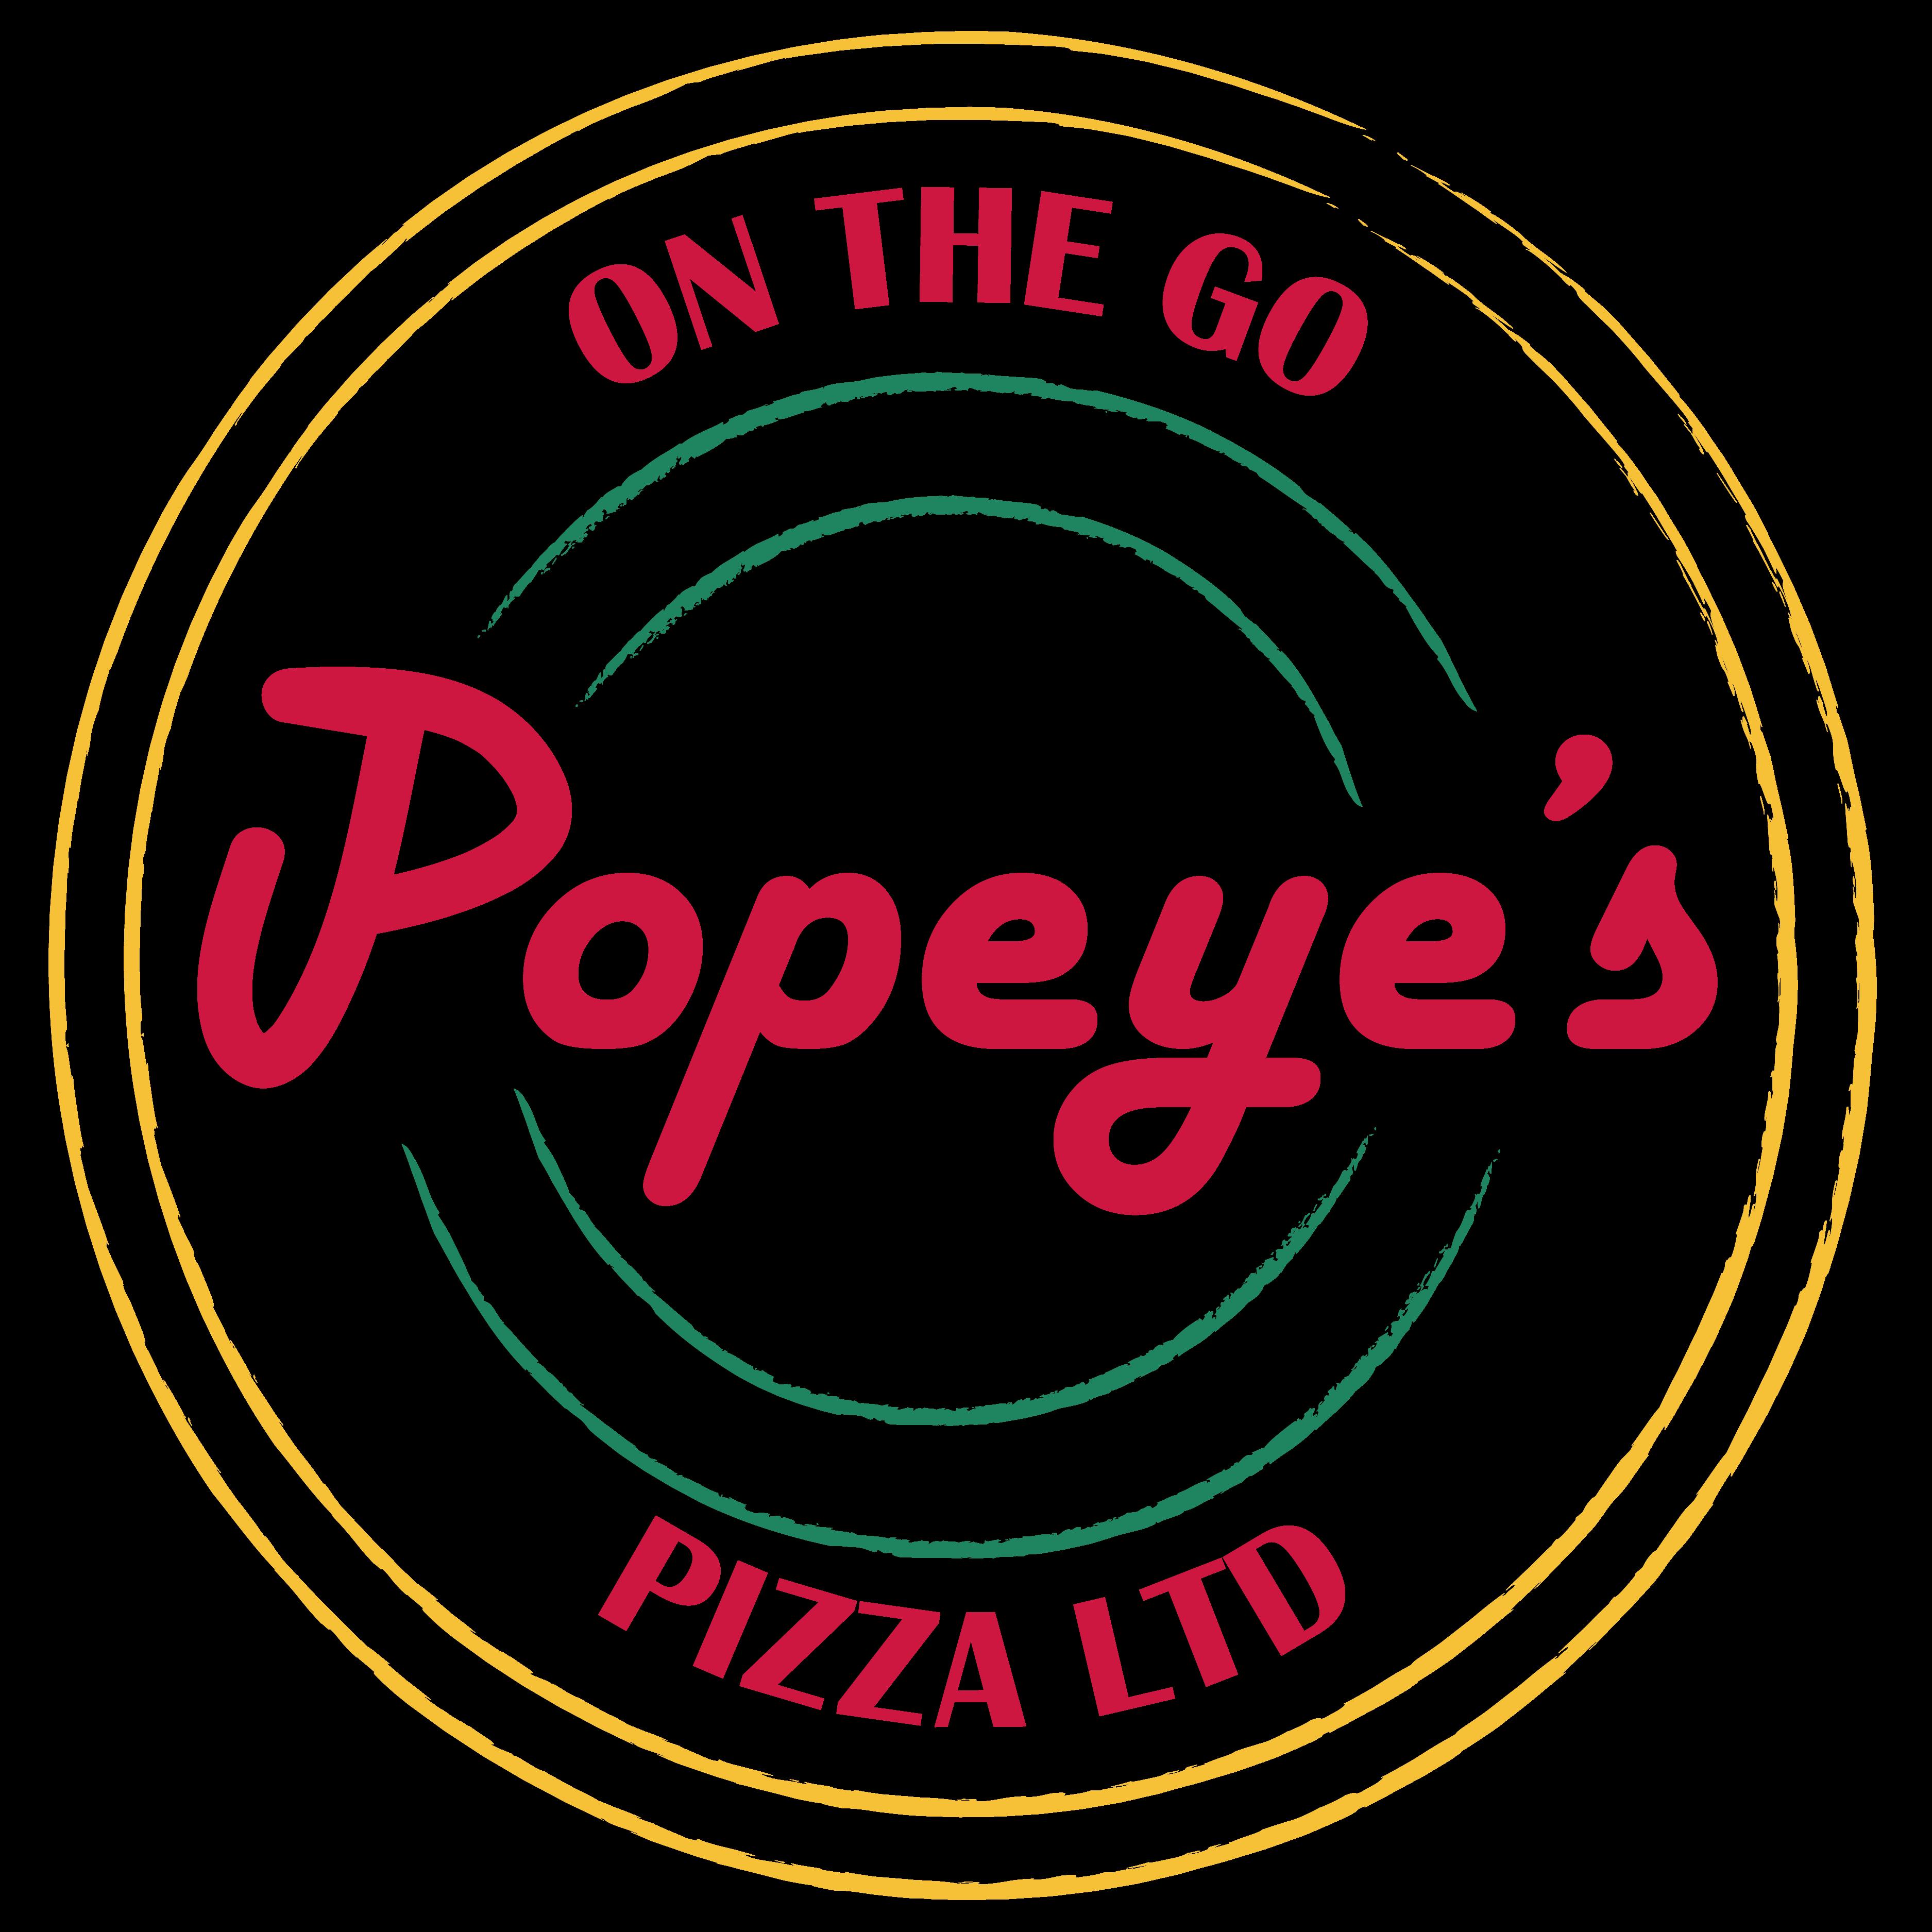 Popeye's Pizza LTD